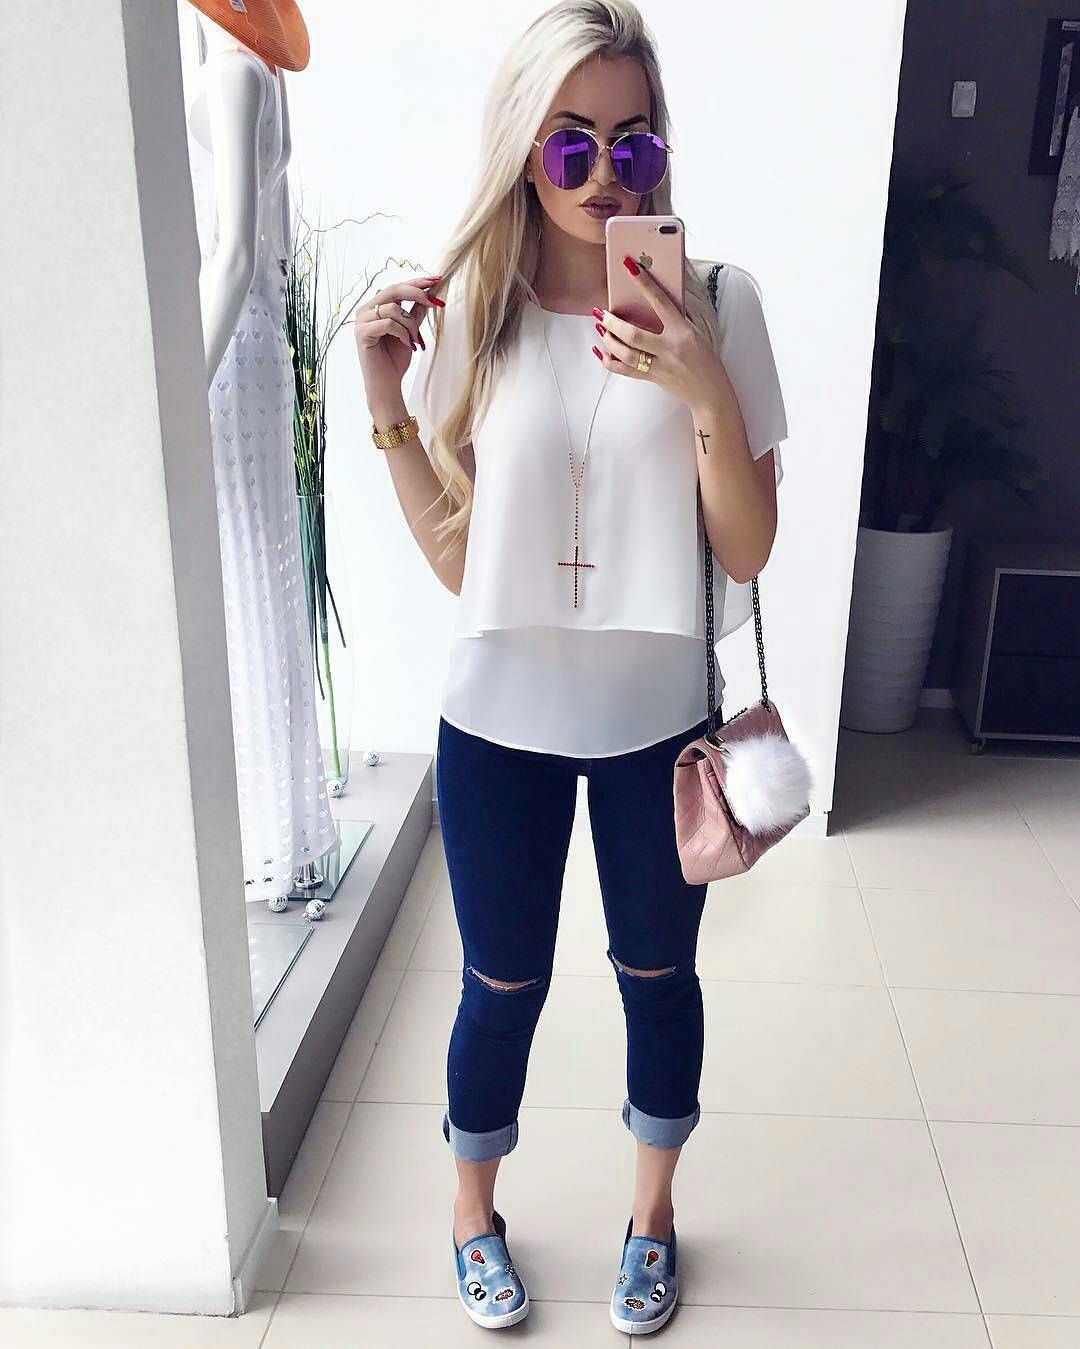 Moda Tumblr Girls (@modatumblrgirls) • Fotos y vídeos de Instagram | LOOKs